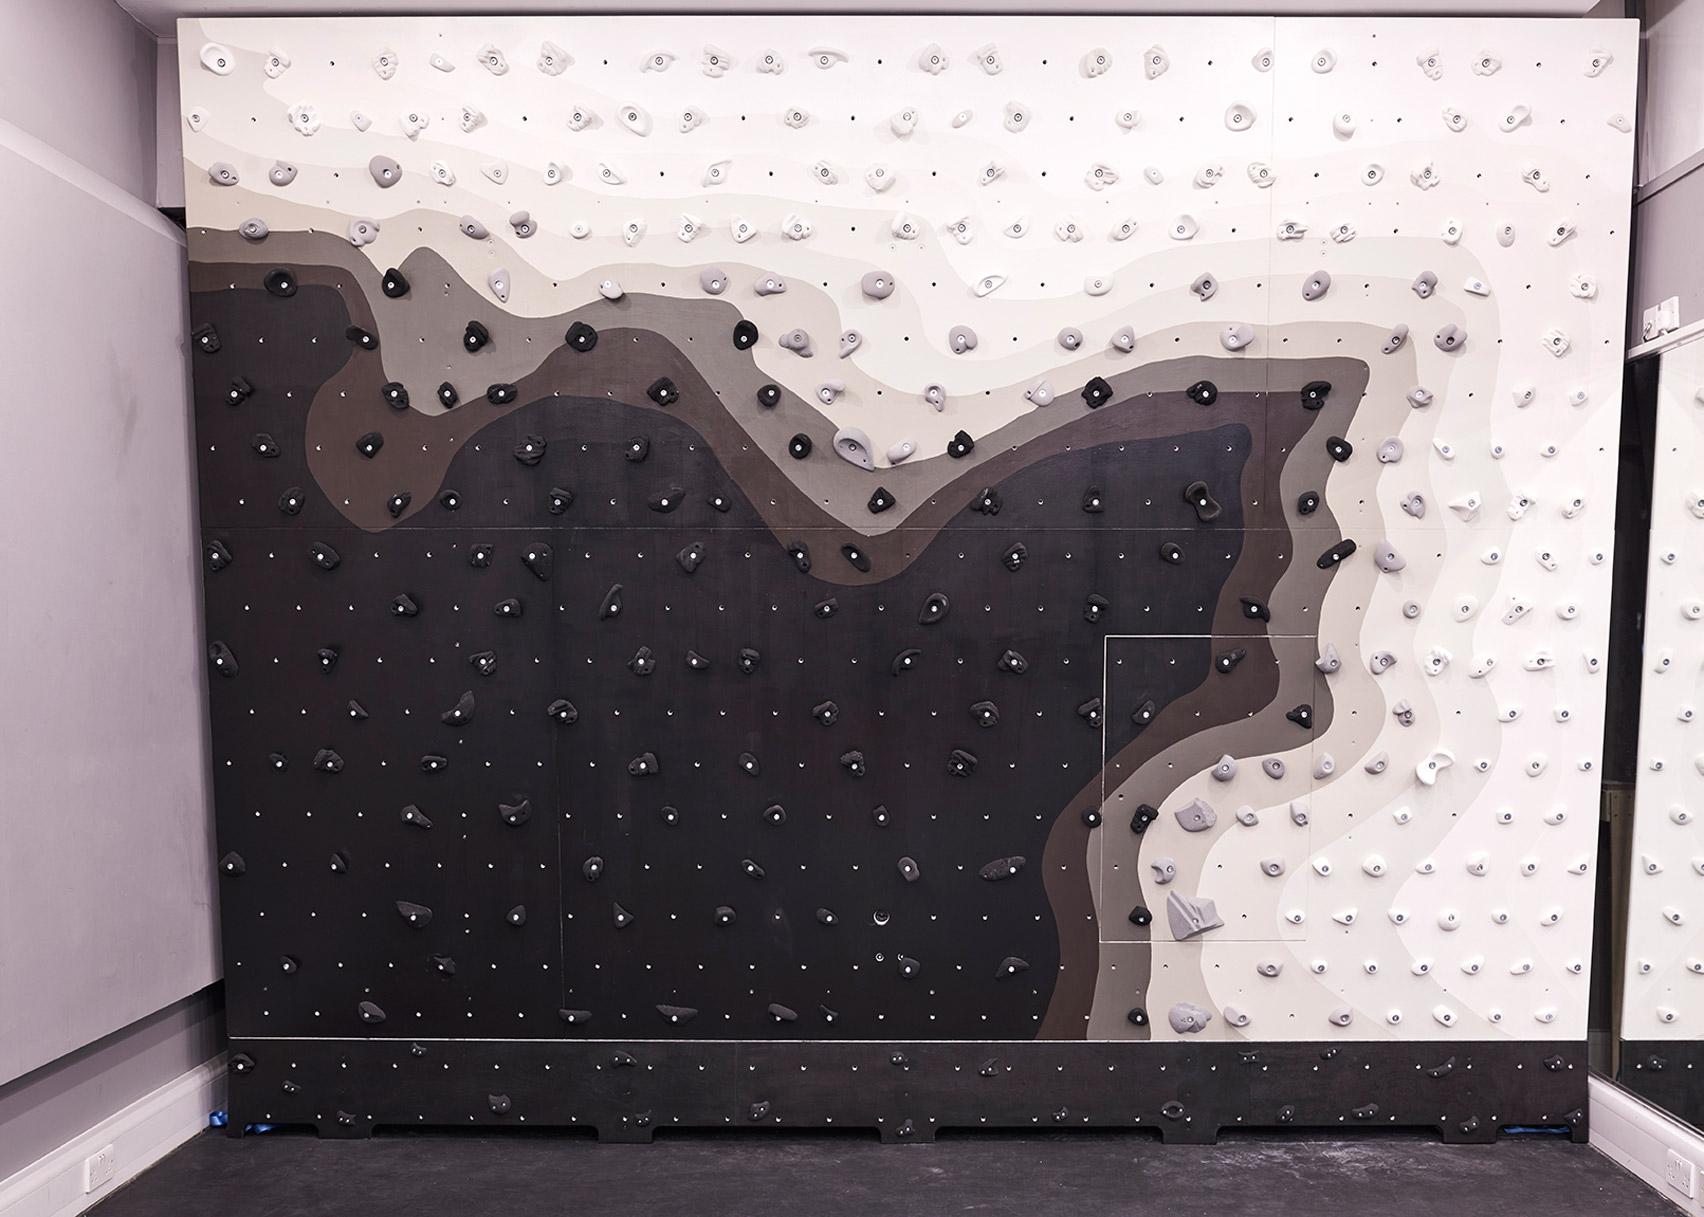 Patternity installs monochrome climbing wall inside London's Ace Hotel